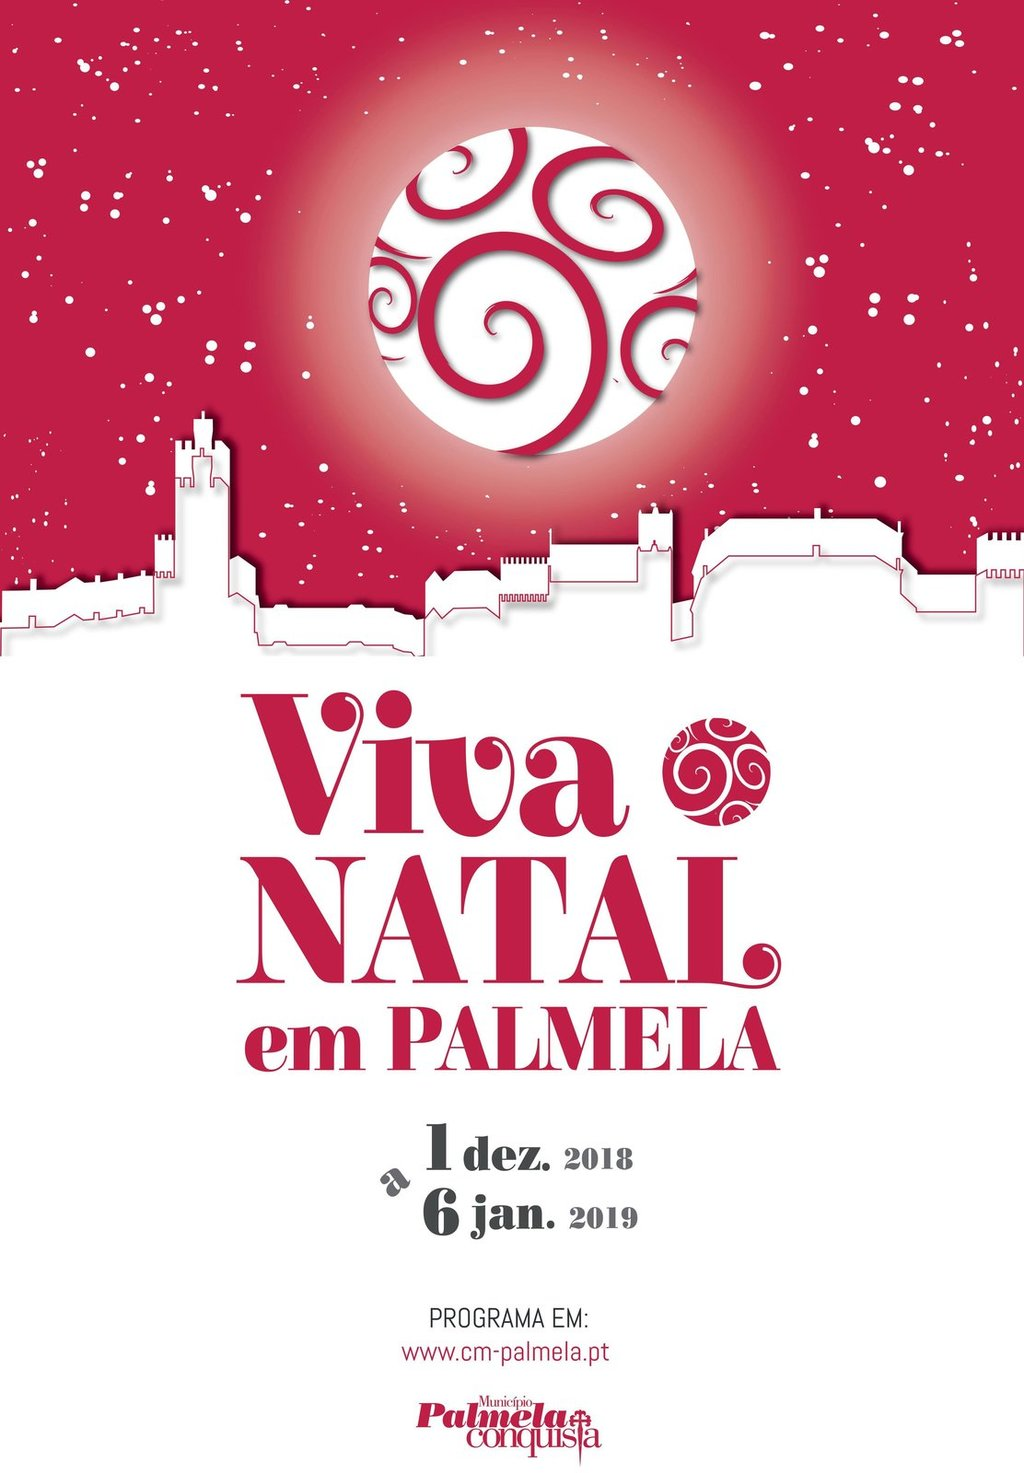 natal Viva o Natal em Palmela